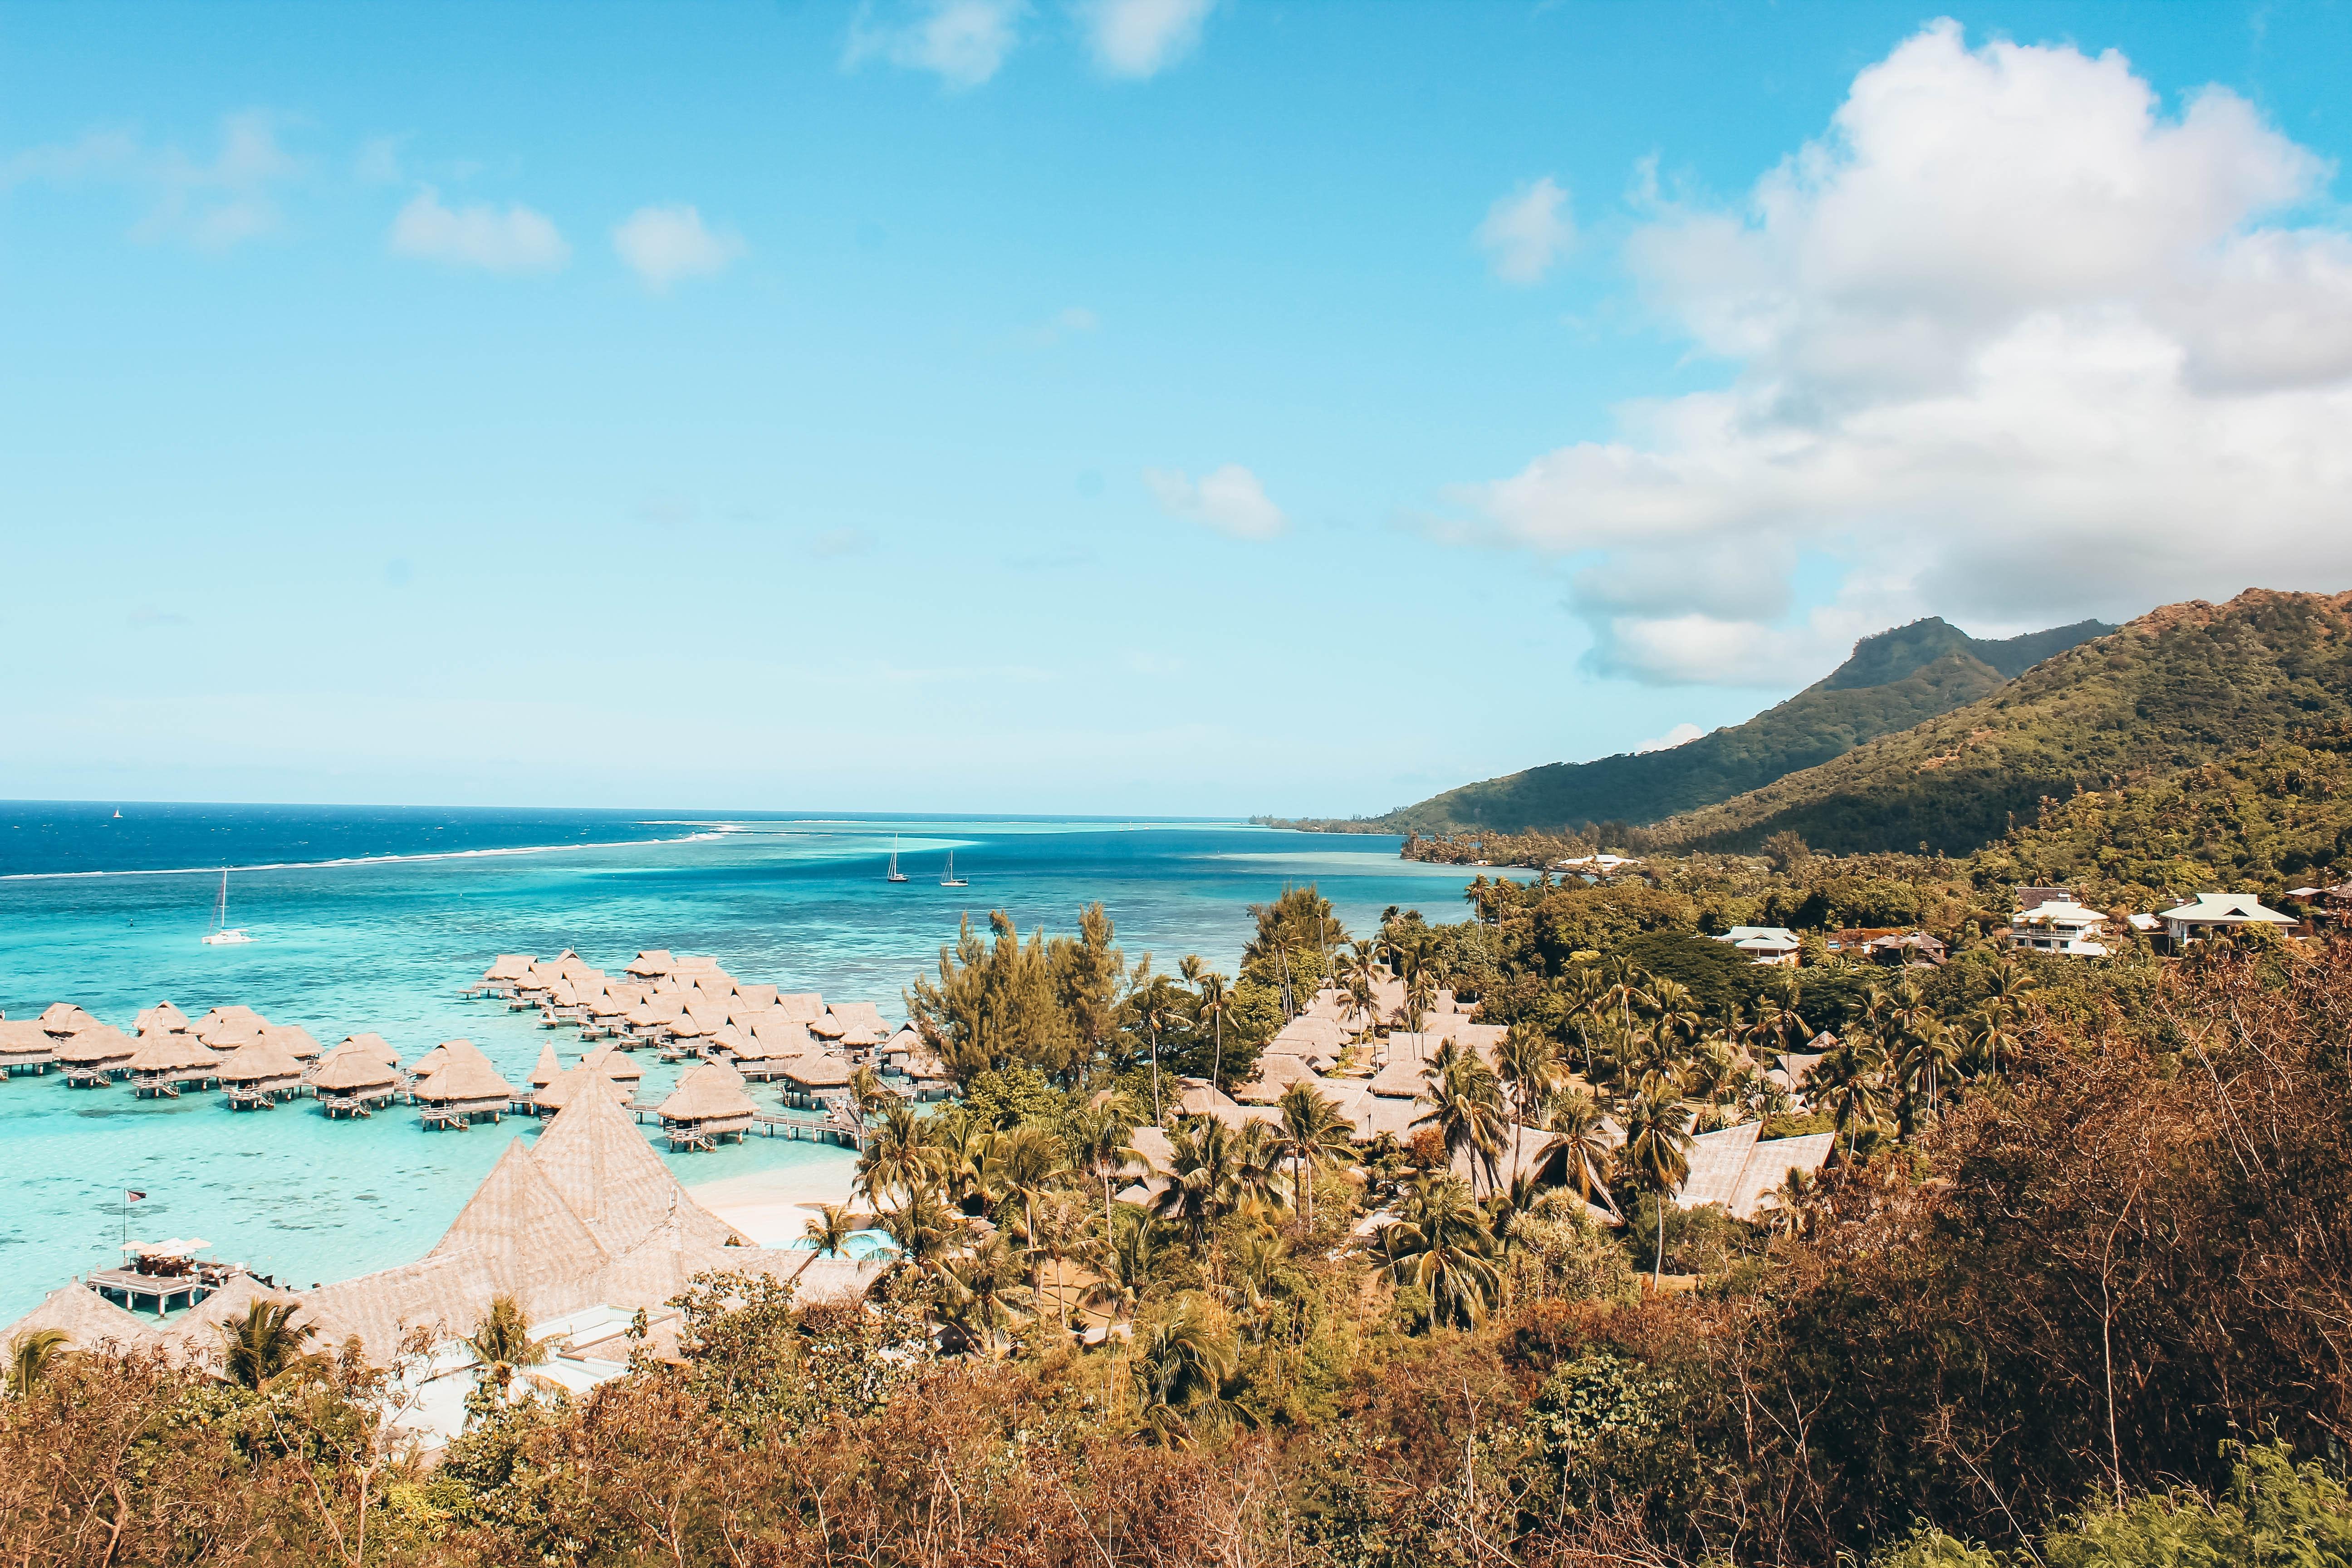 Free Images Bay Beach Bora Bora Clear Water Crystal